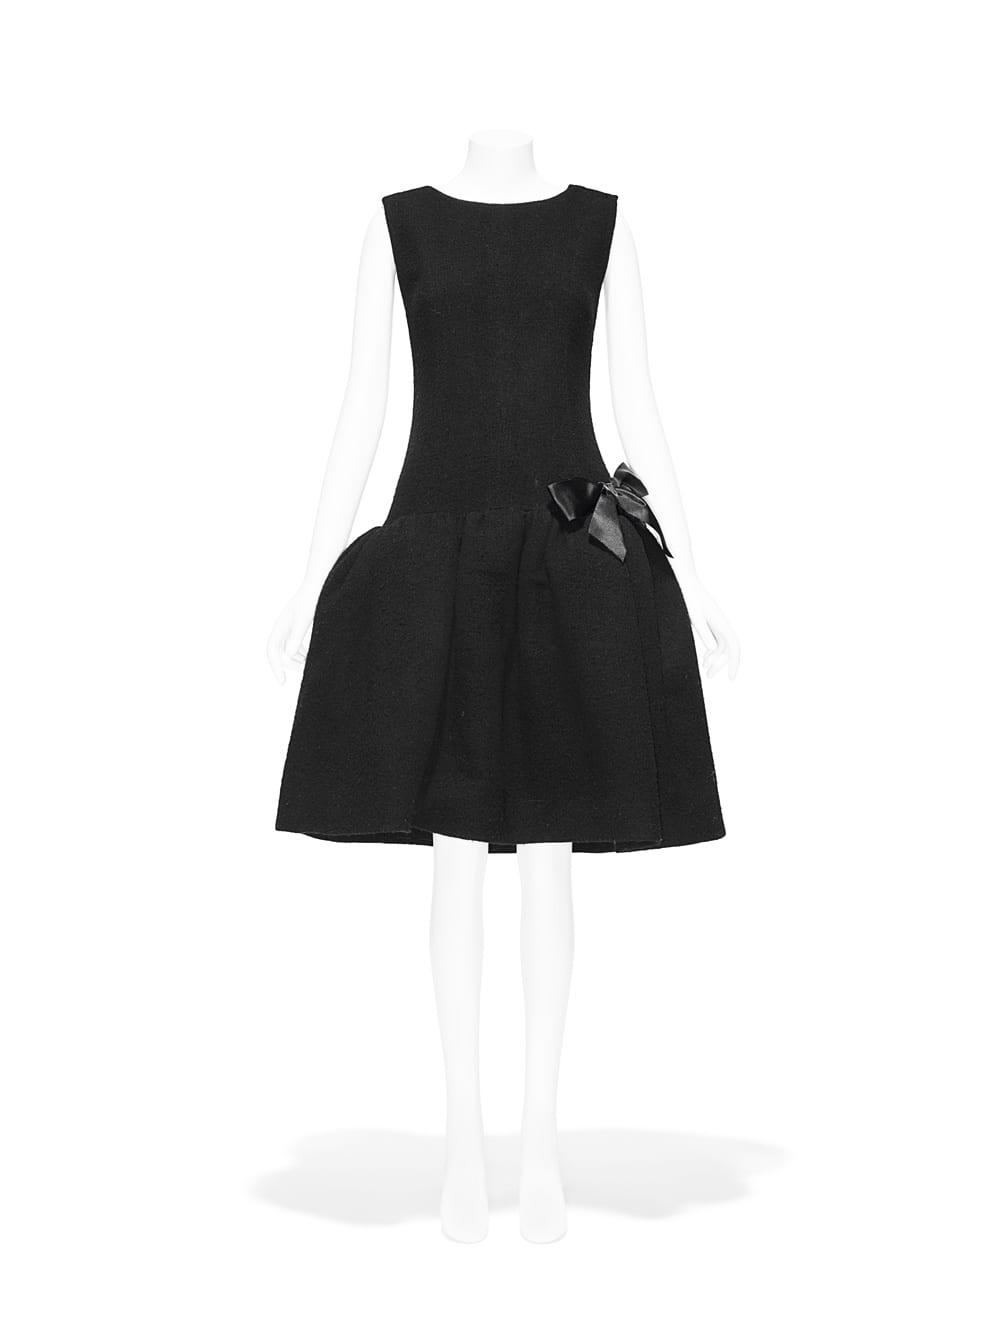 Timeline Dress, Cristóbal Balenciaga (Spanish, 1895–1972), fall/winter 1958–59; Gift of Rosamond Bernier, 1973 (1973.58.1a, b). Image courtesy of The Metropolitan Museum of Art, Photo © Nicholas Alan Cope